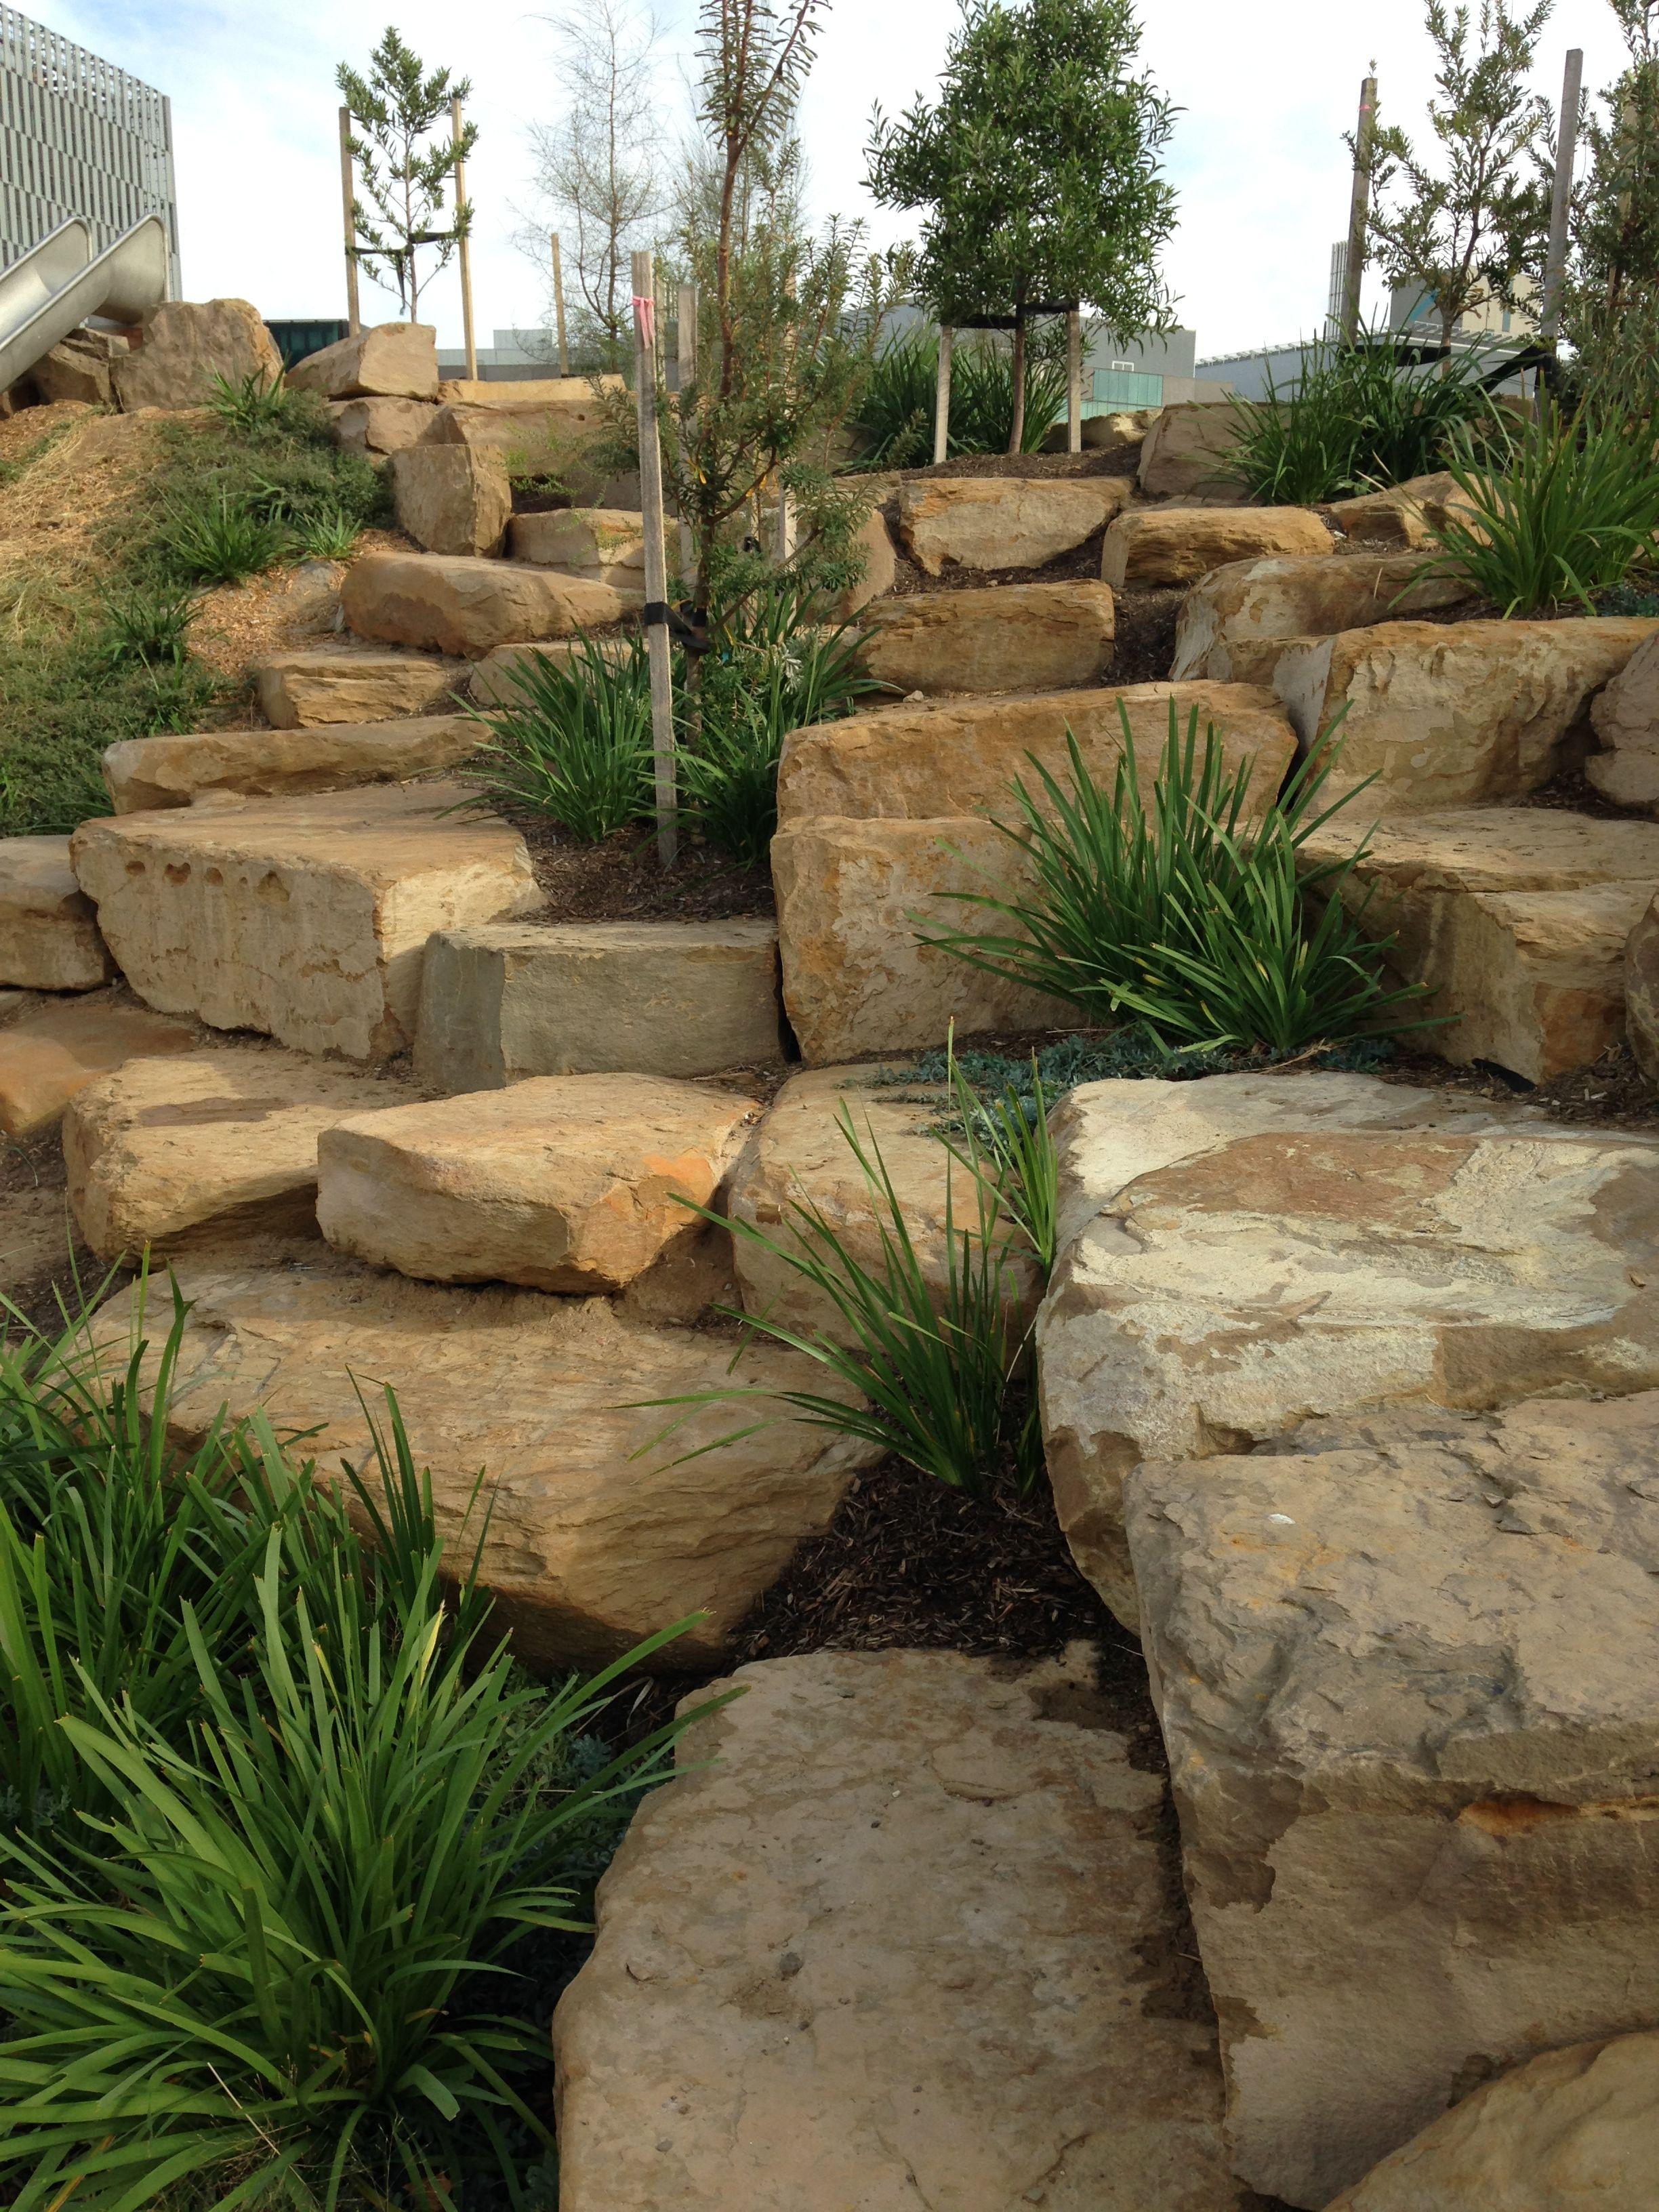 Pin by Shenouda on Shenouda1 | Rock garden design ...